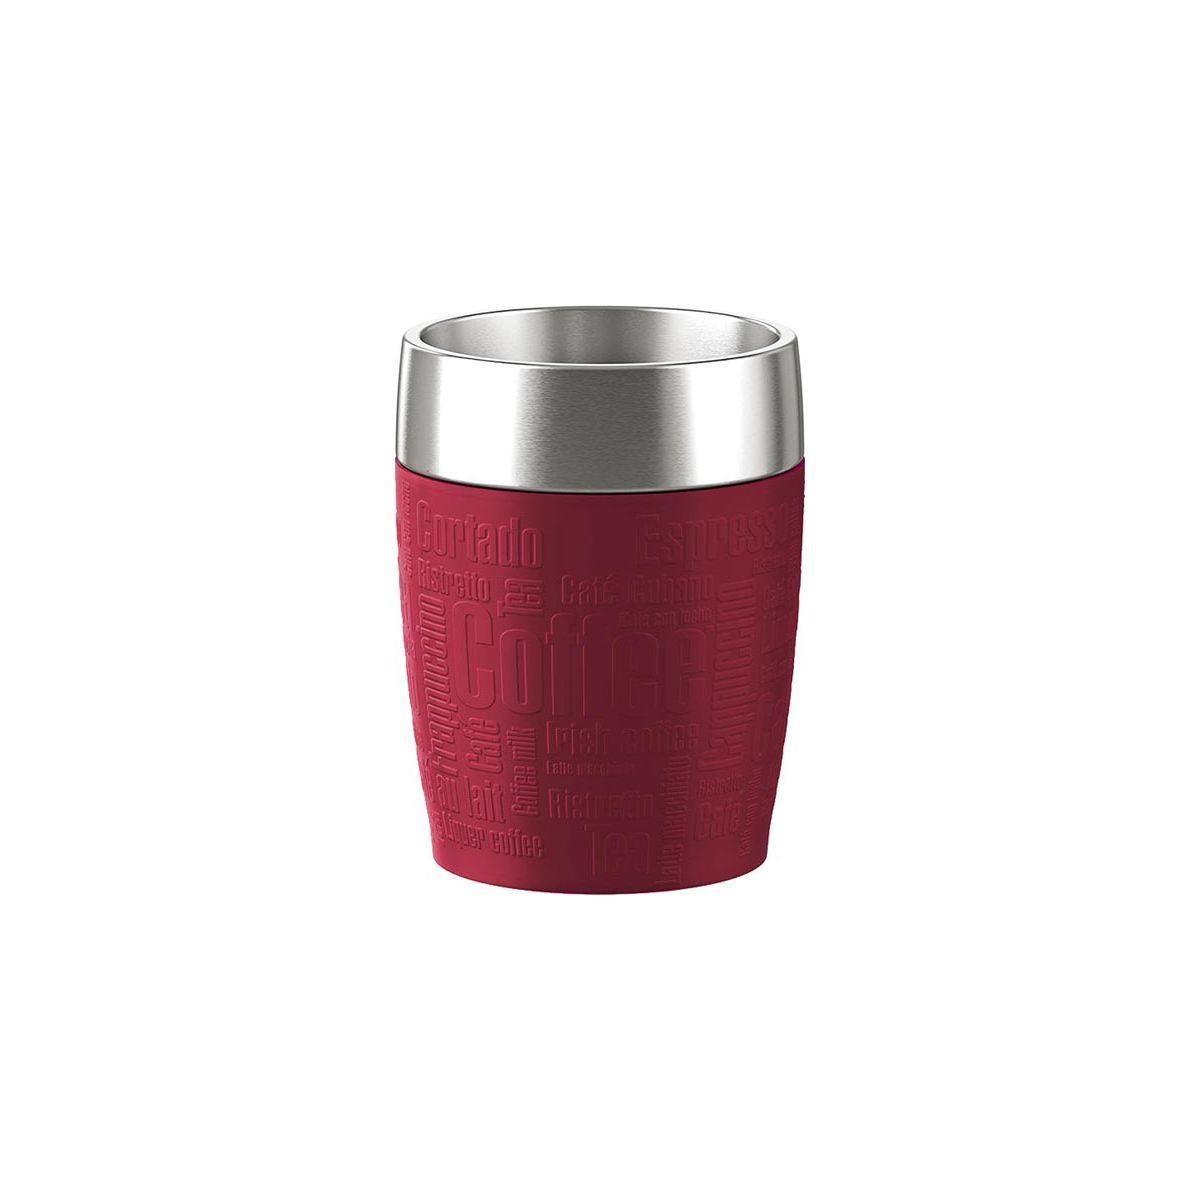 Mug emsa isotherme 0.2l inox/rouge - 15% de remise immédiate avec le code : cash15 (photo)